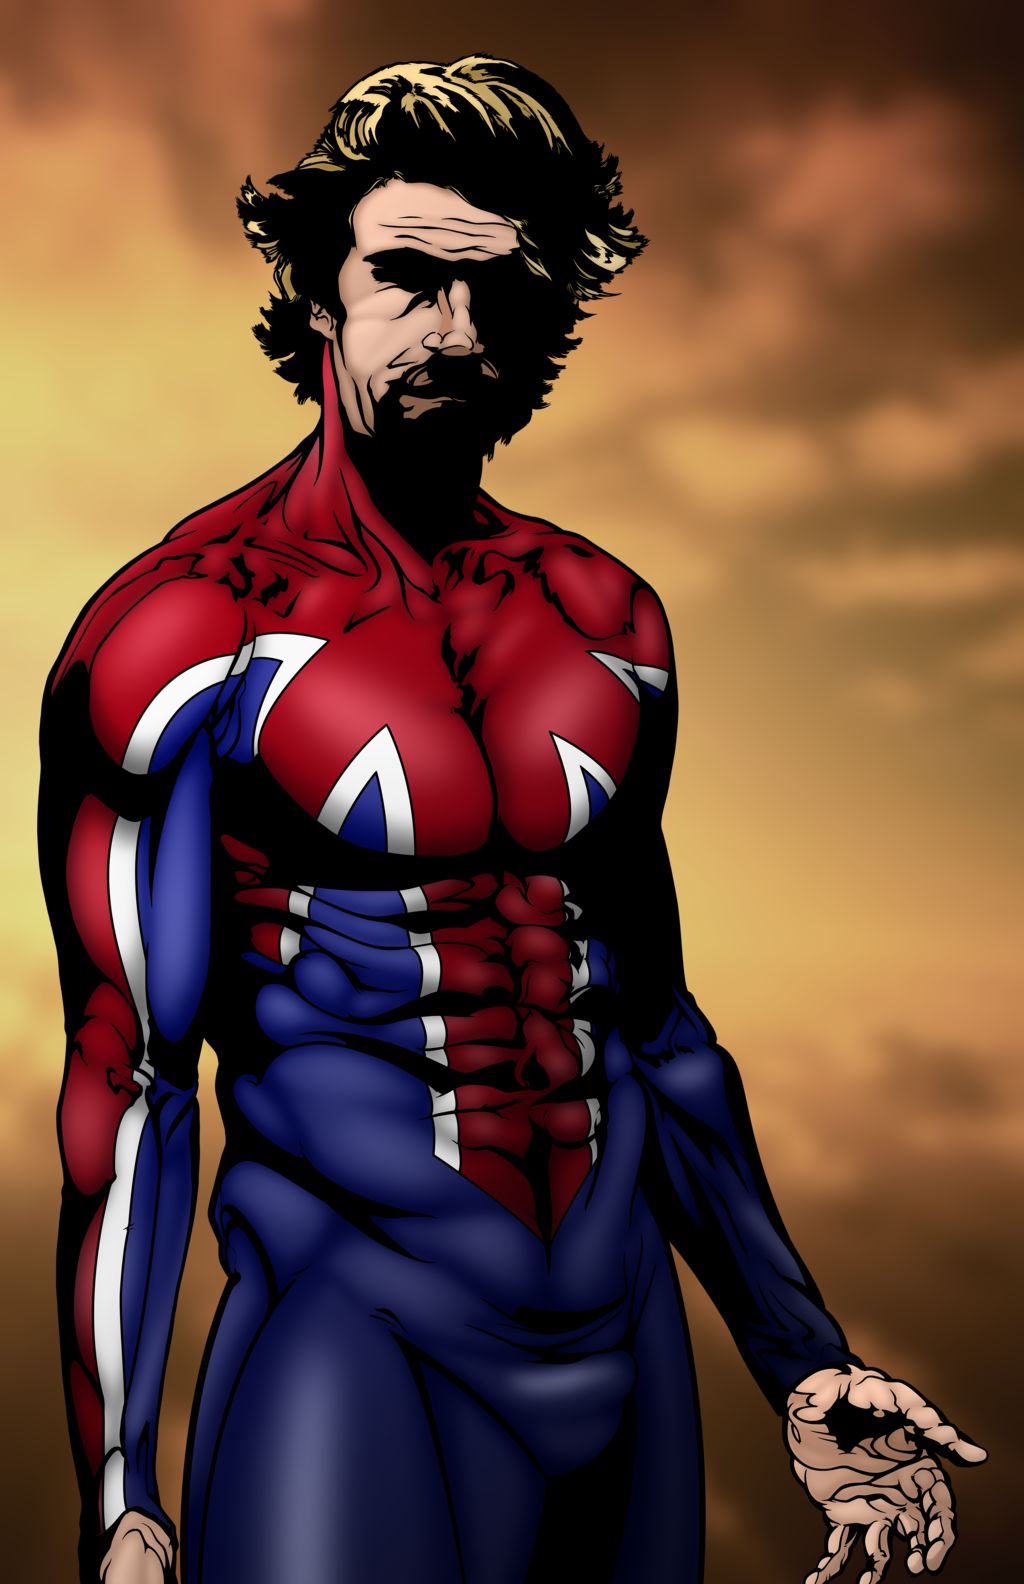 Best 51 Captain Britain Wallpaper on HipWallpaper Captain 1024x1584